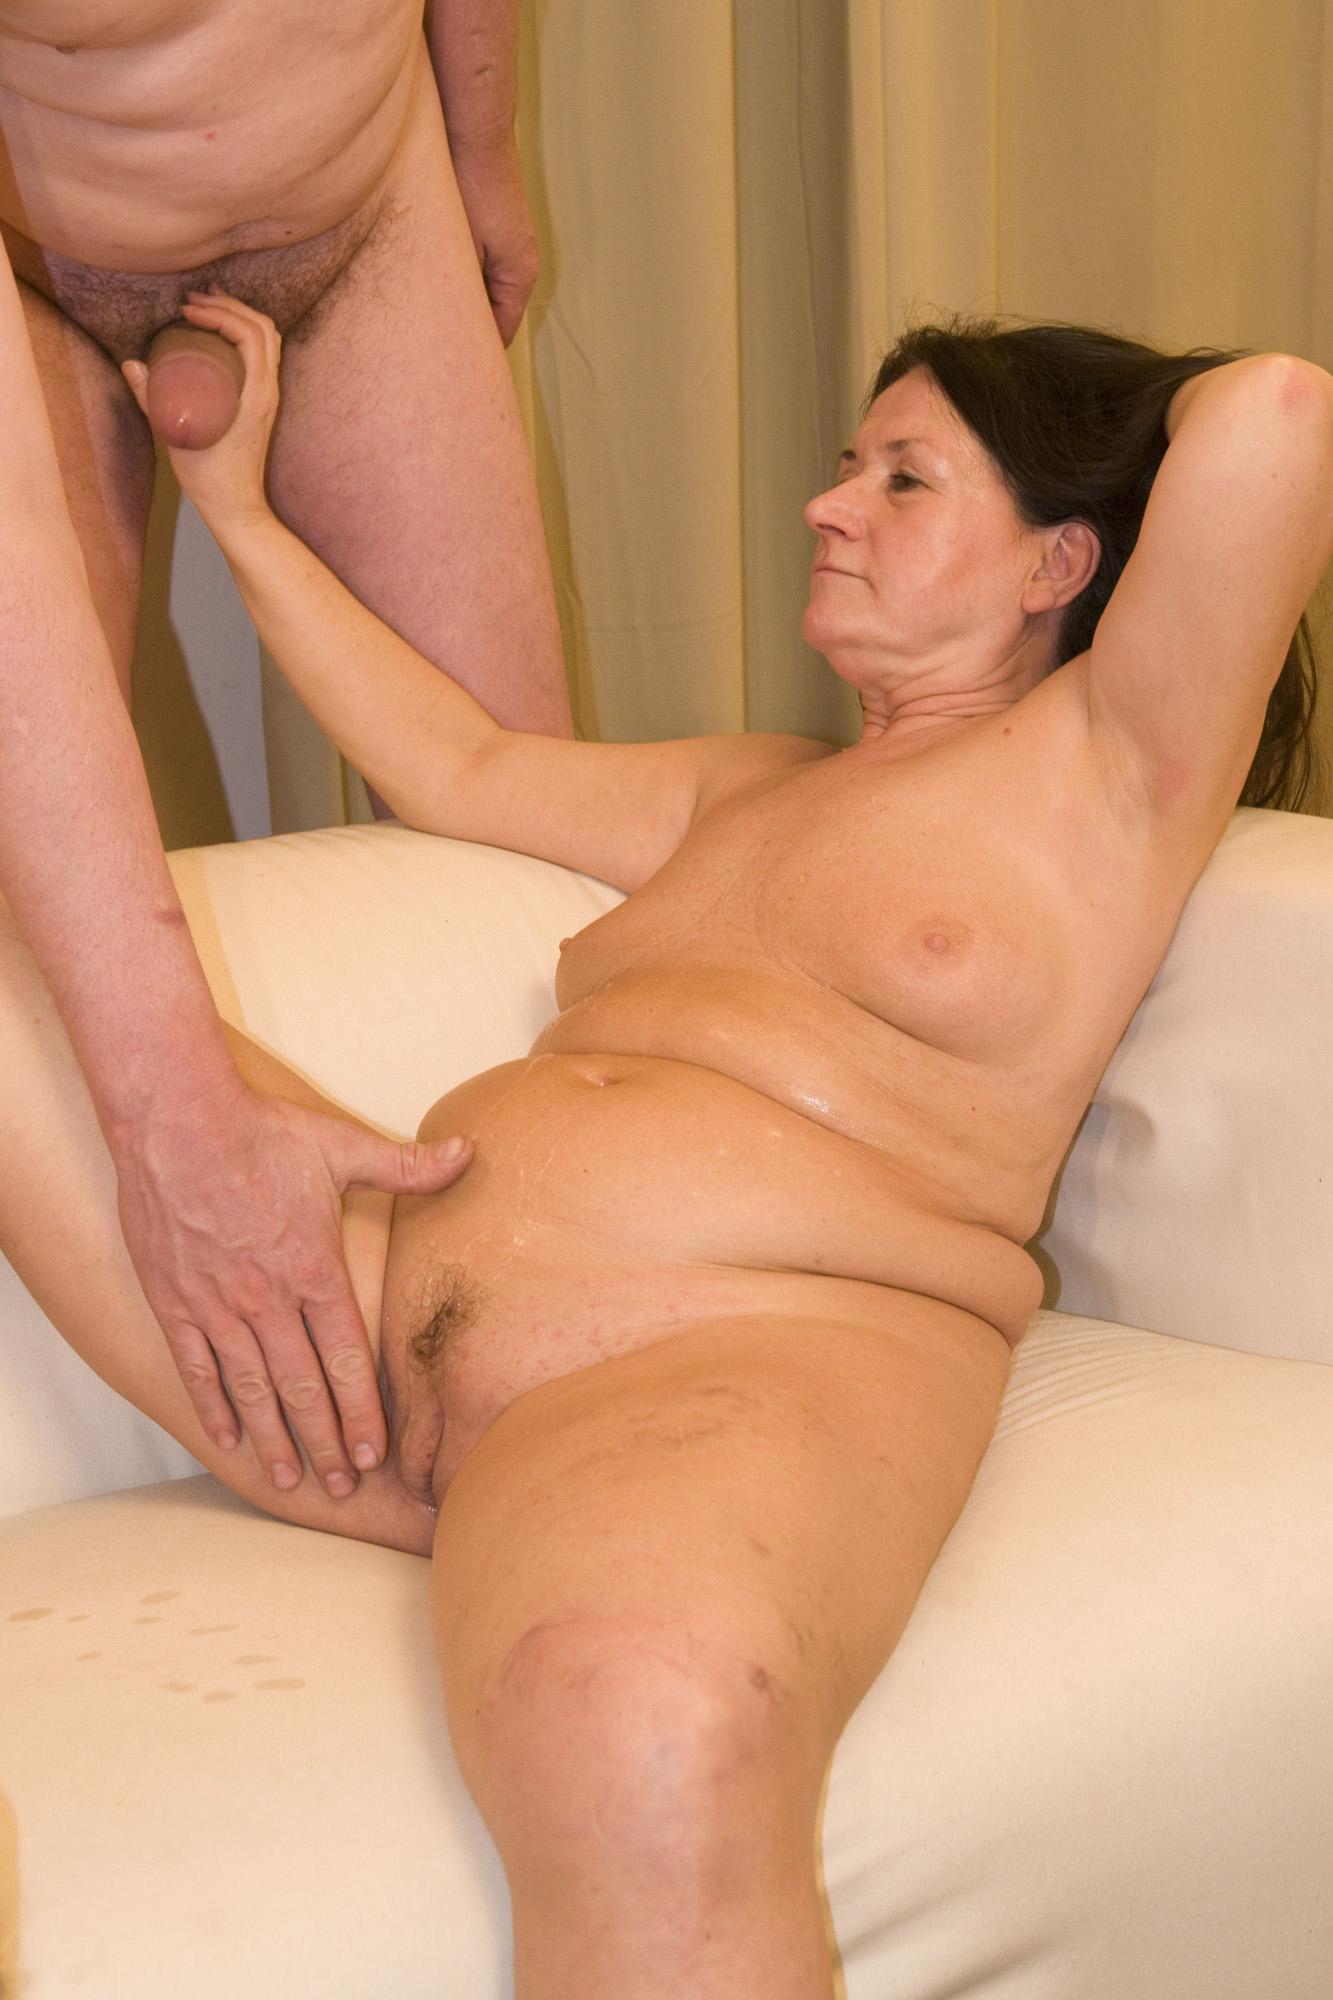 Granny porn samples nude film